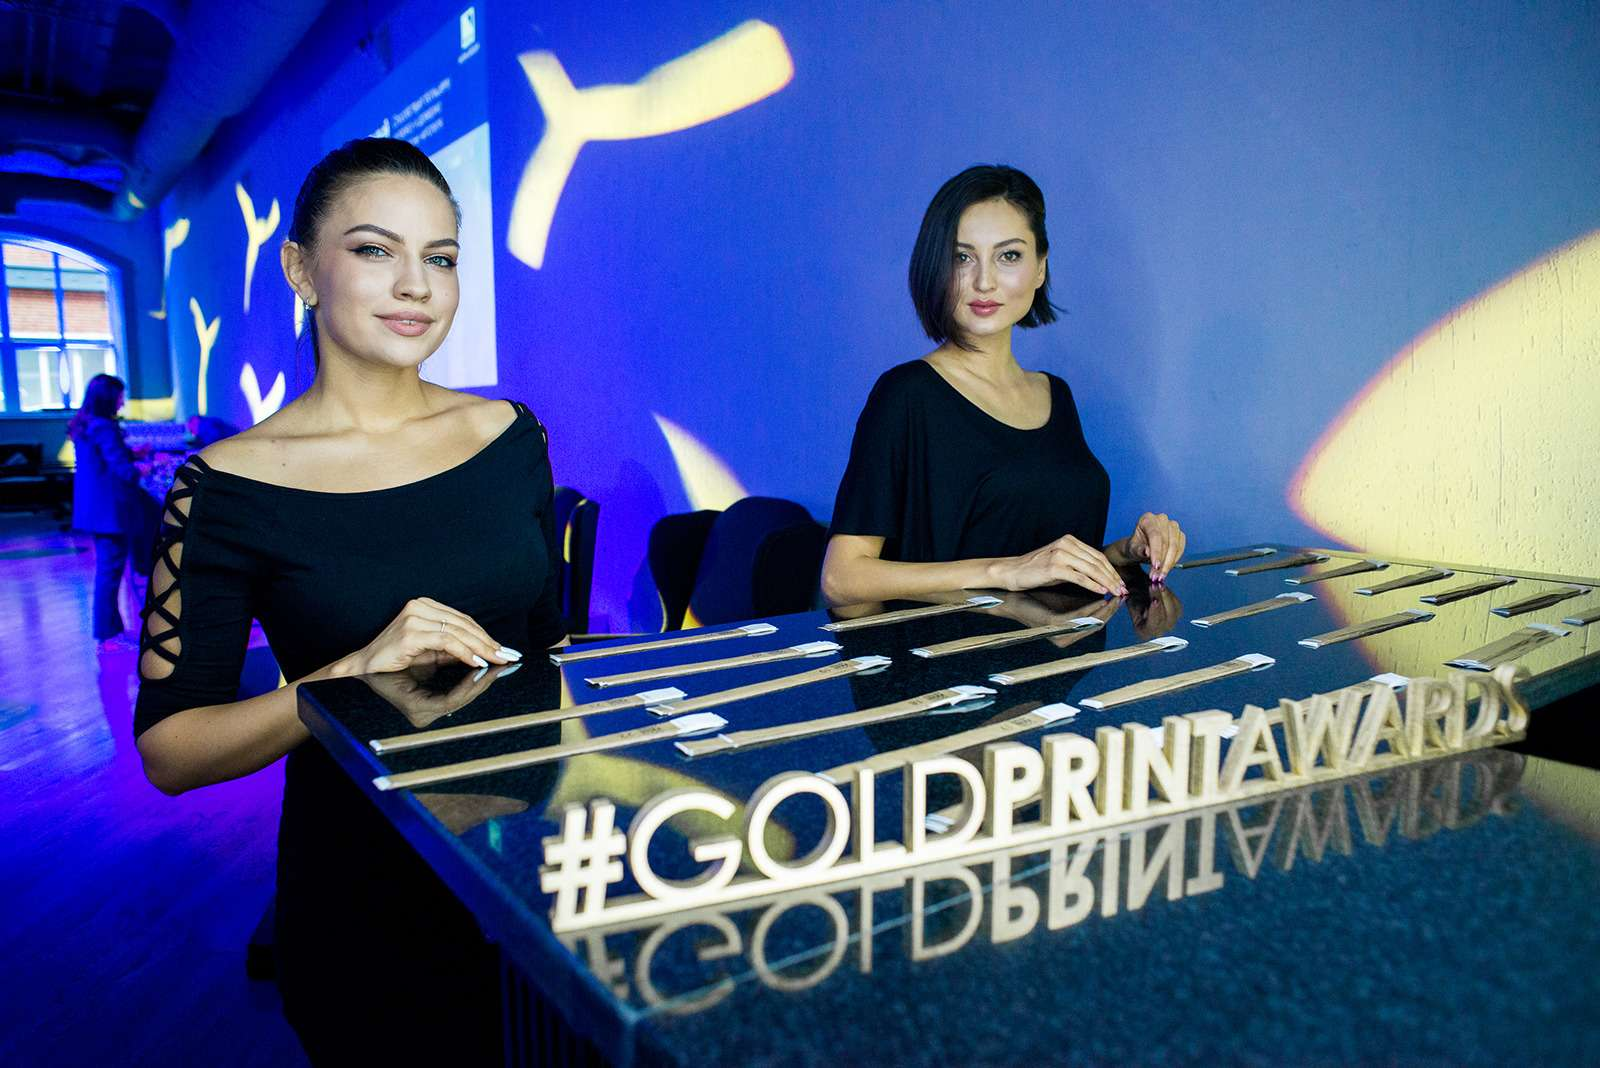 Gold Print Awards: победители названы!— фото 963781